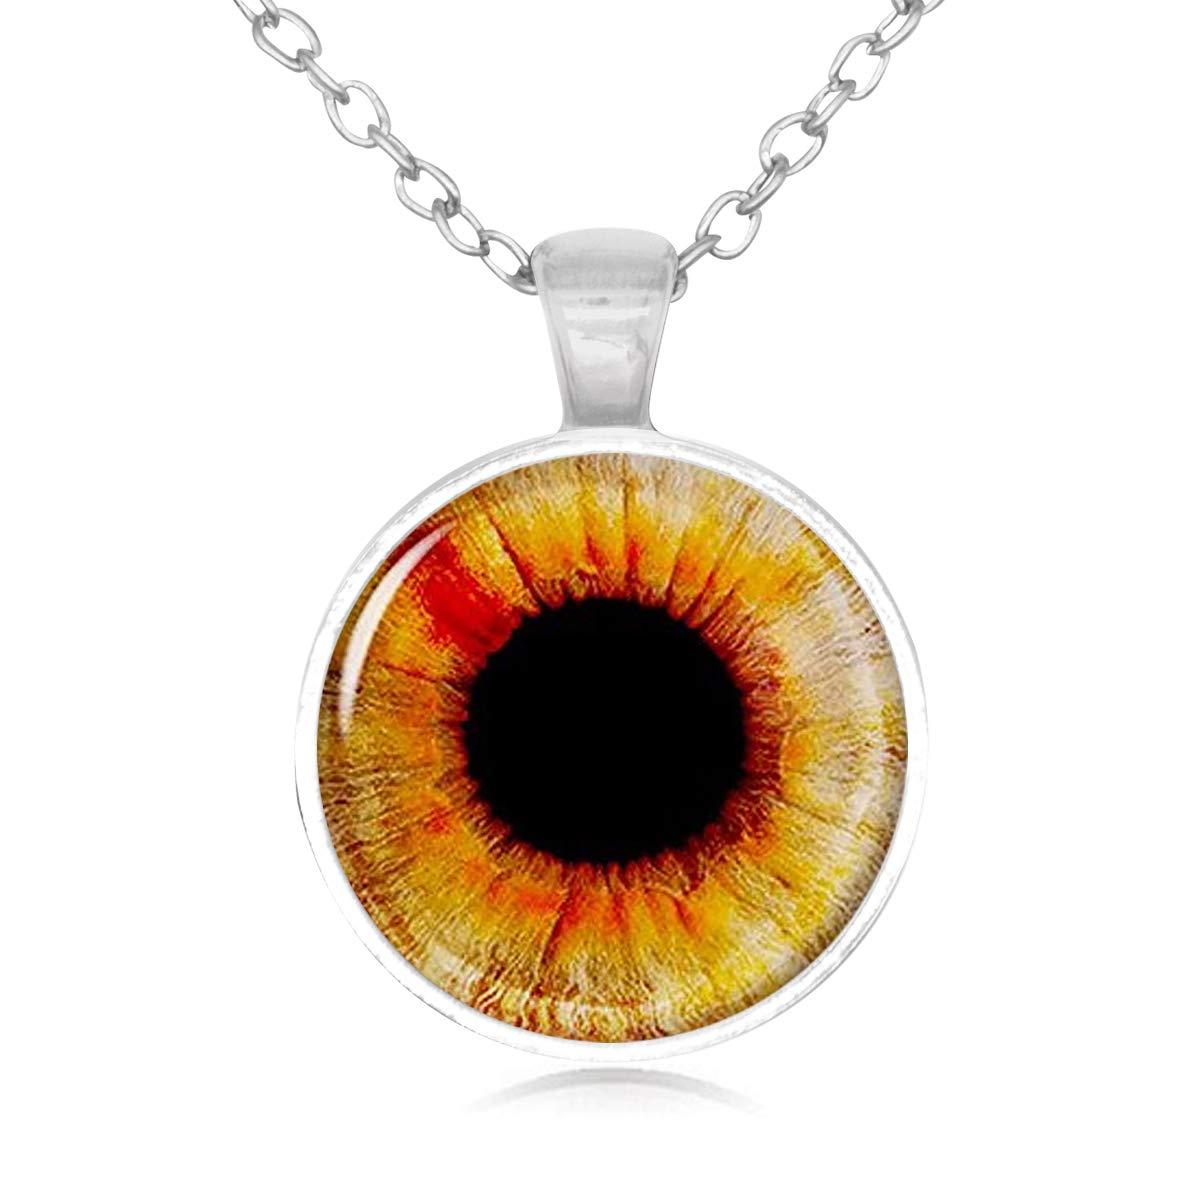 Lightrain Orange Pupil Eyeball Pendant Necklace Vintage Bronze Chain Statement Necklace Handmade Jewelry Gifts